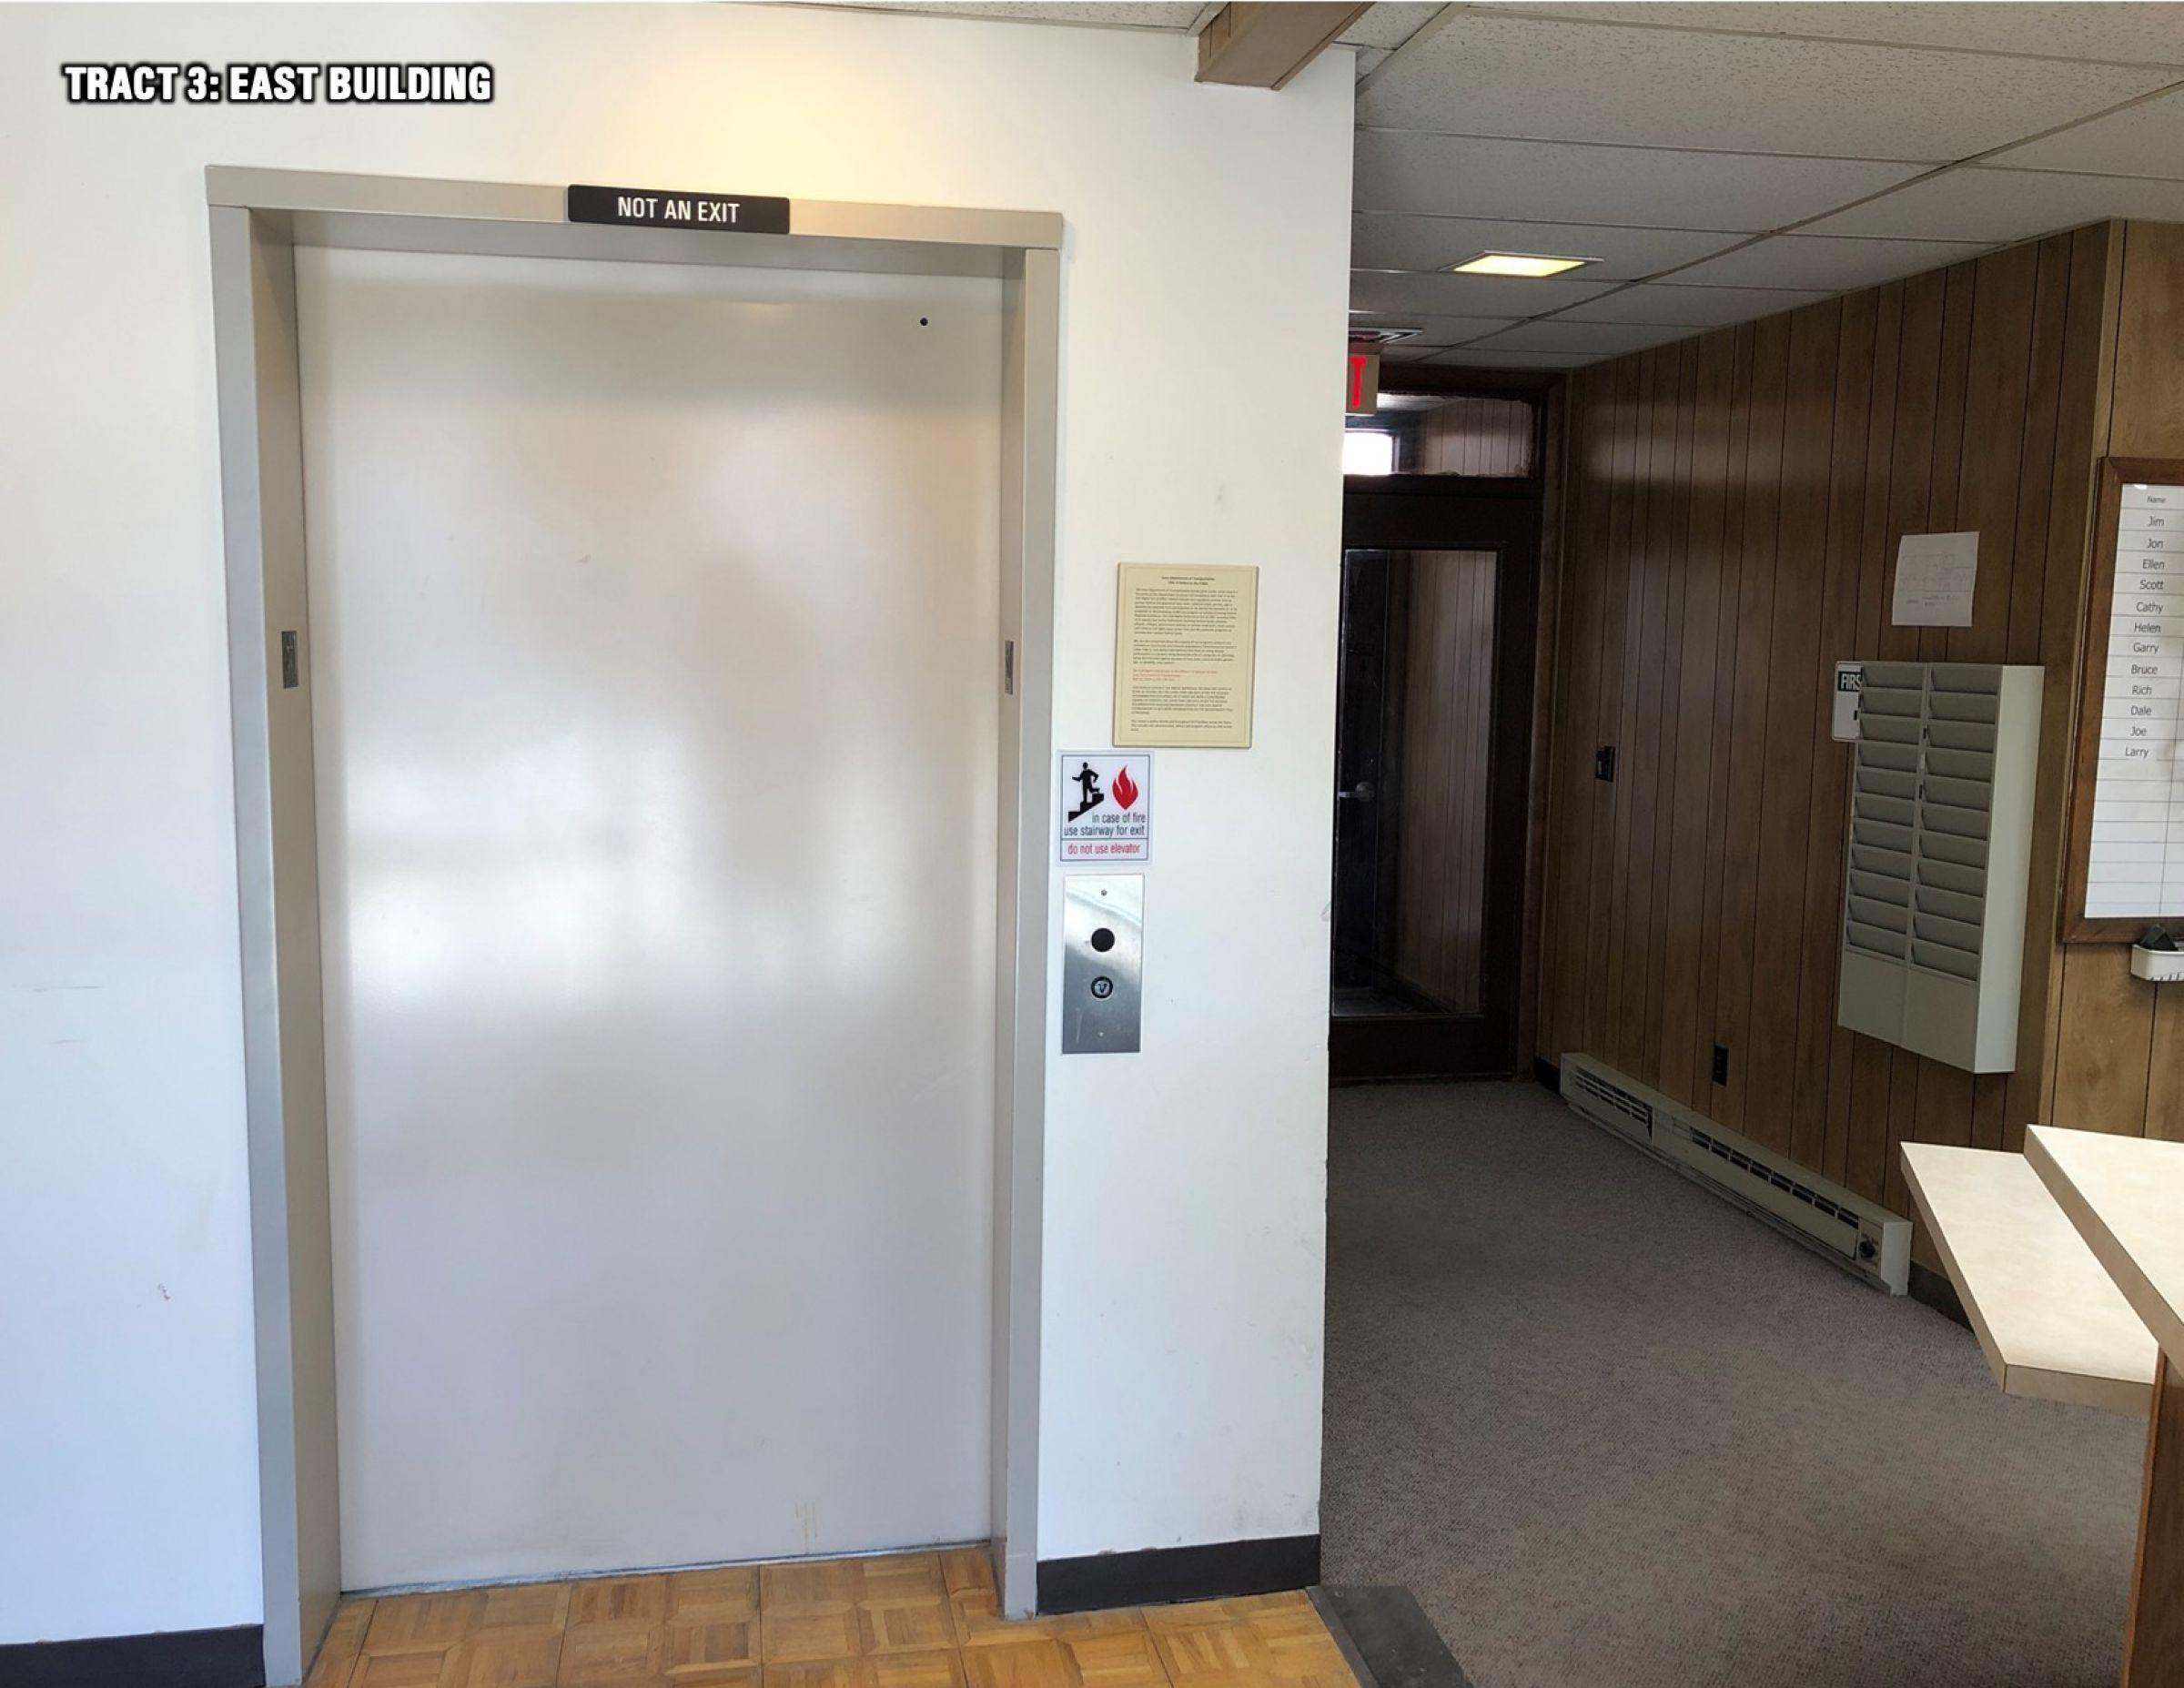 East Bldg Elevator